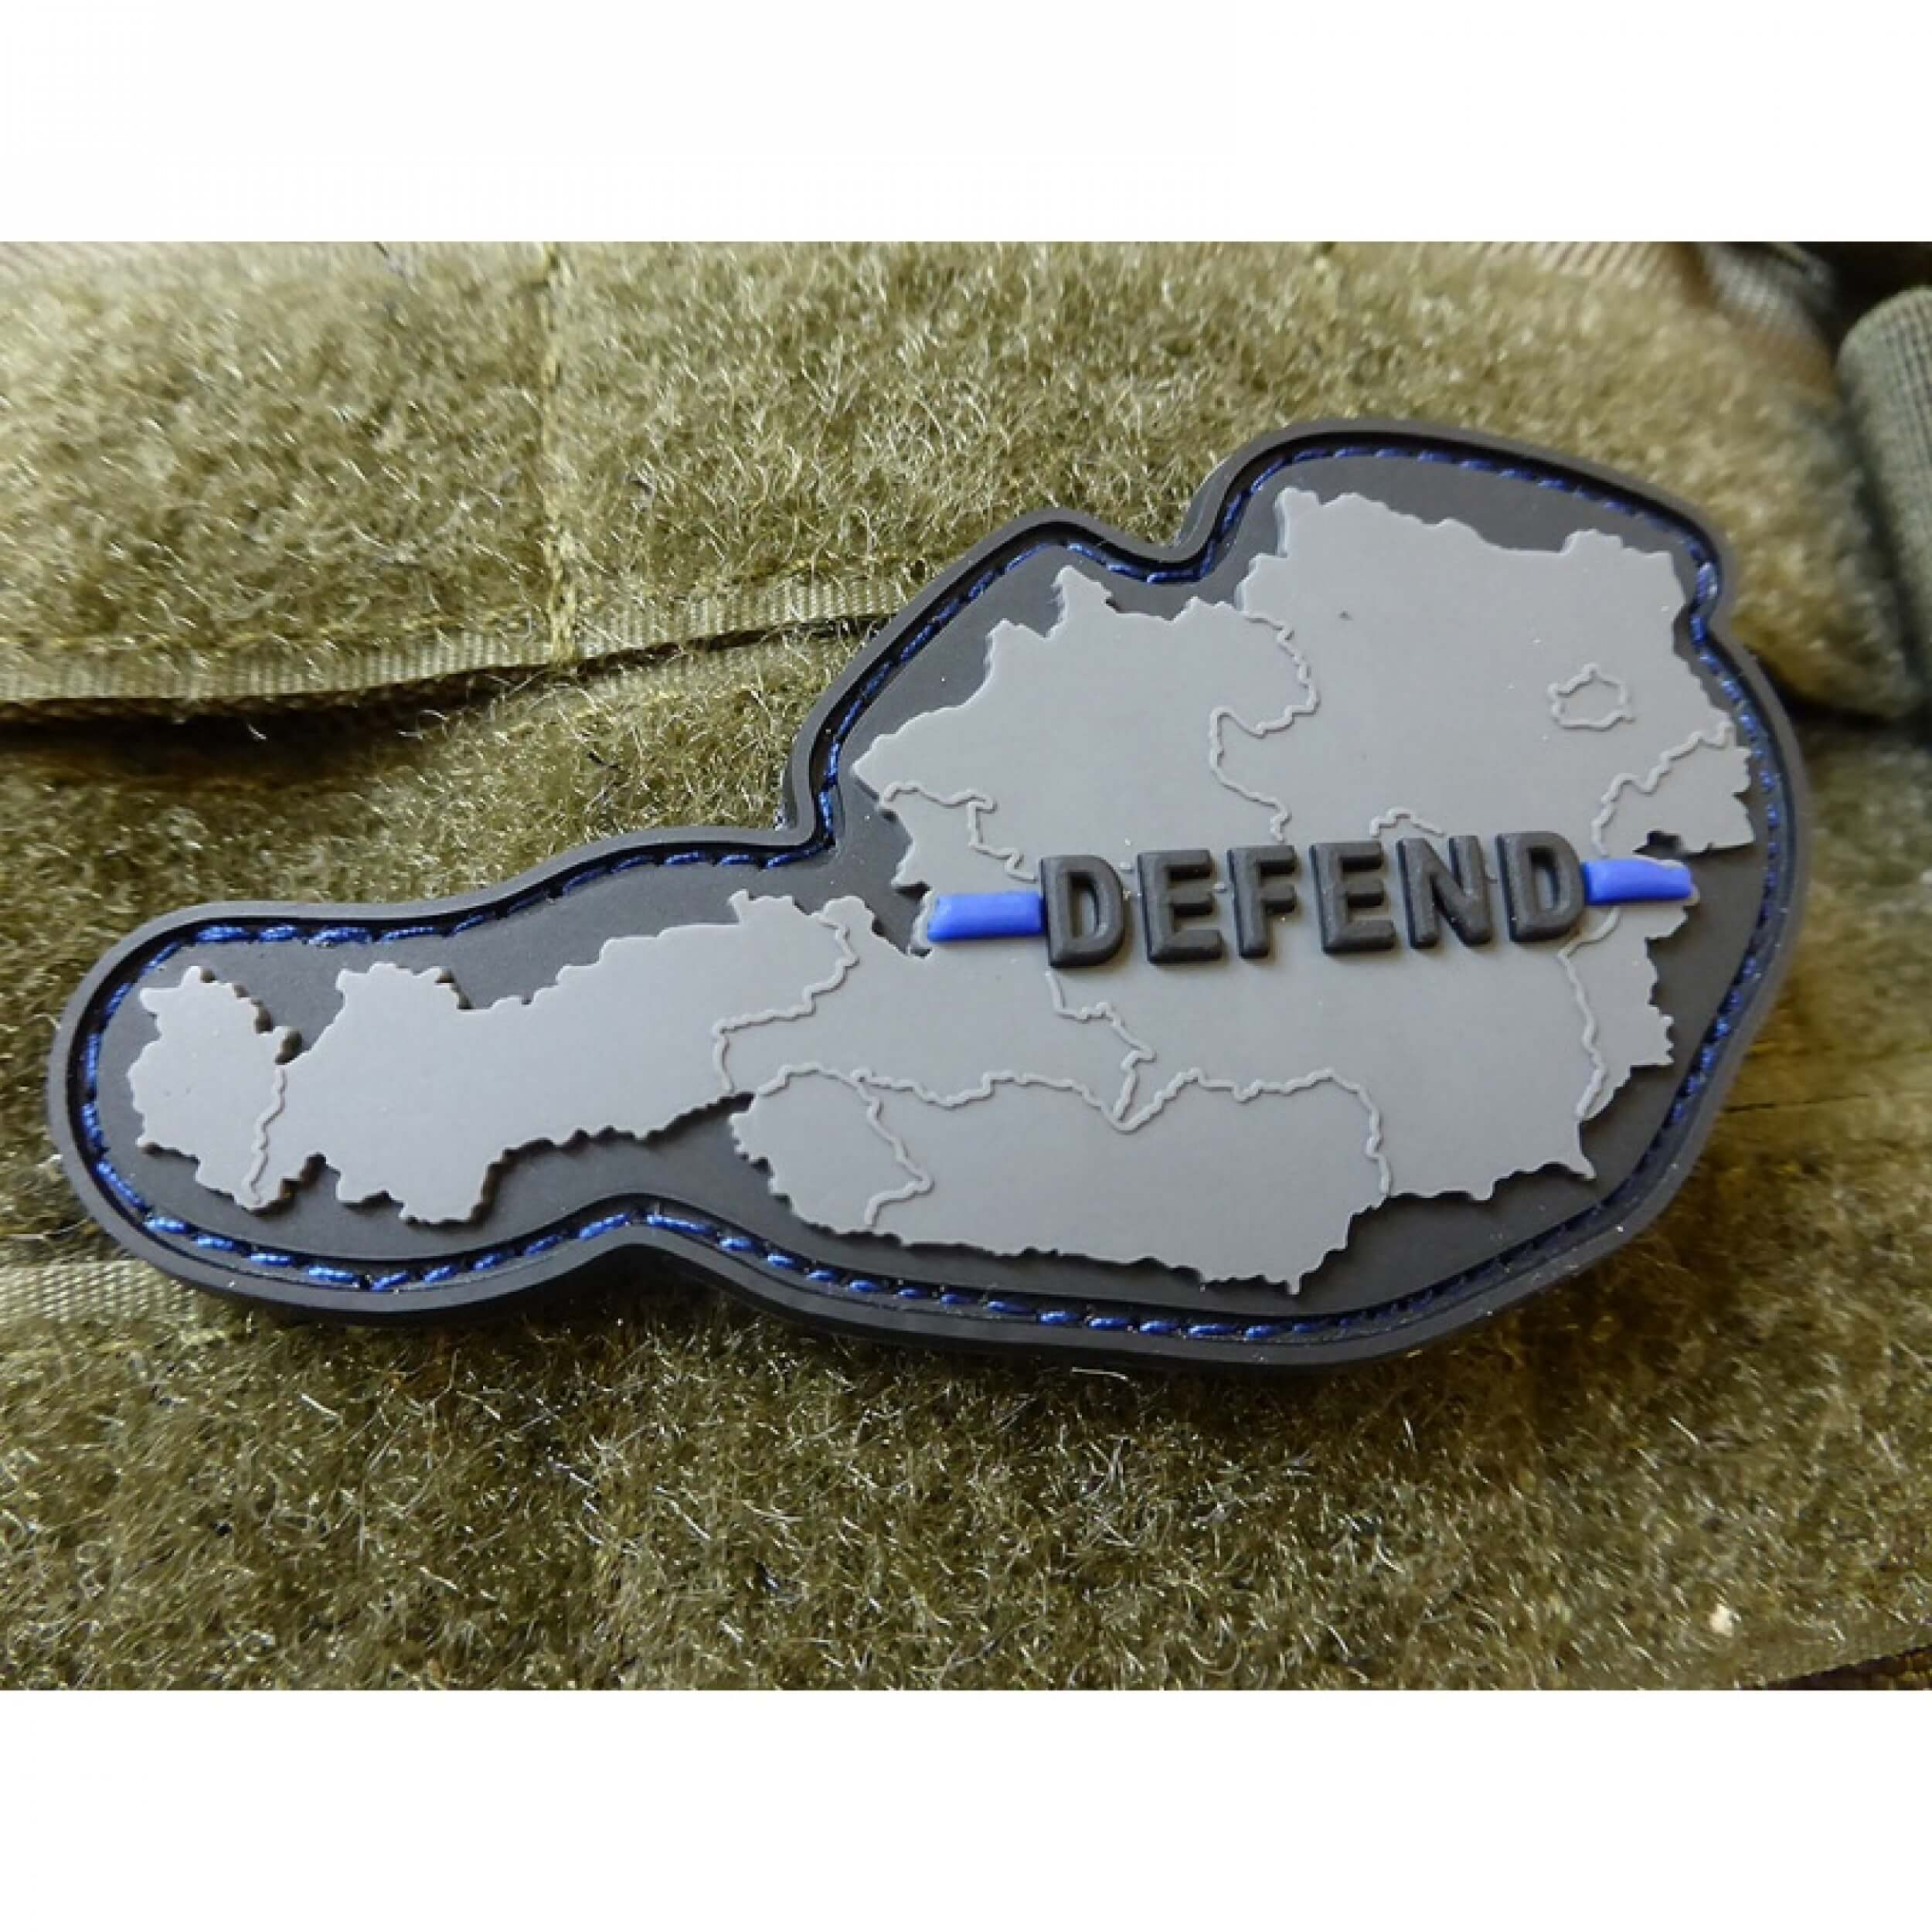 Defend Austria Österreich Patch, Thin Blue Line, Special Edition